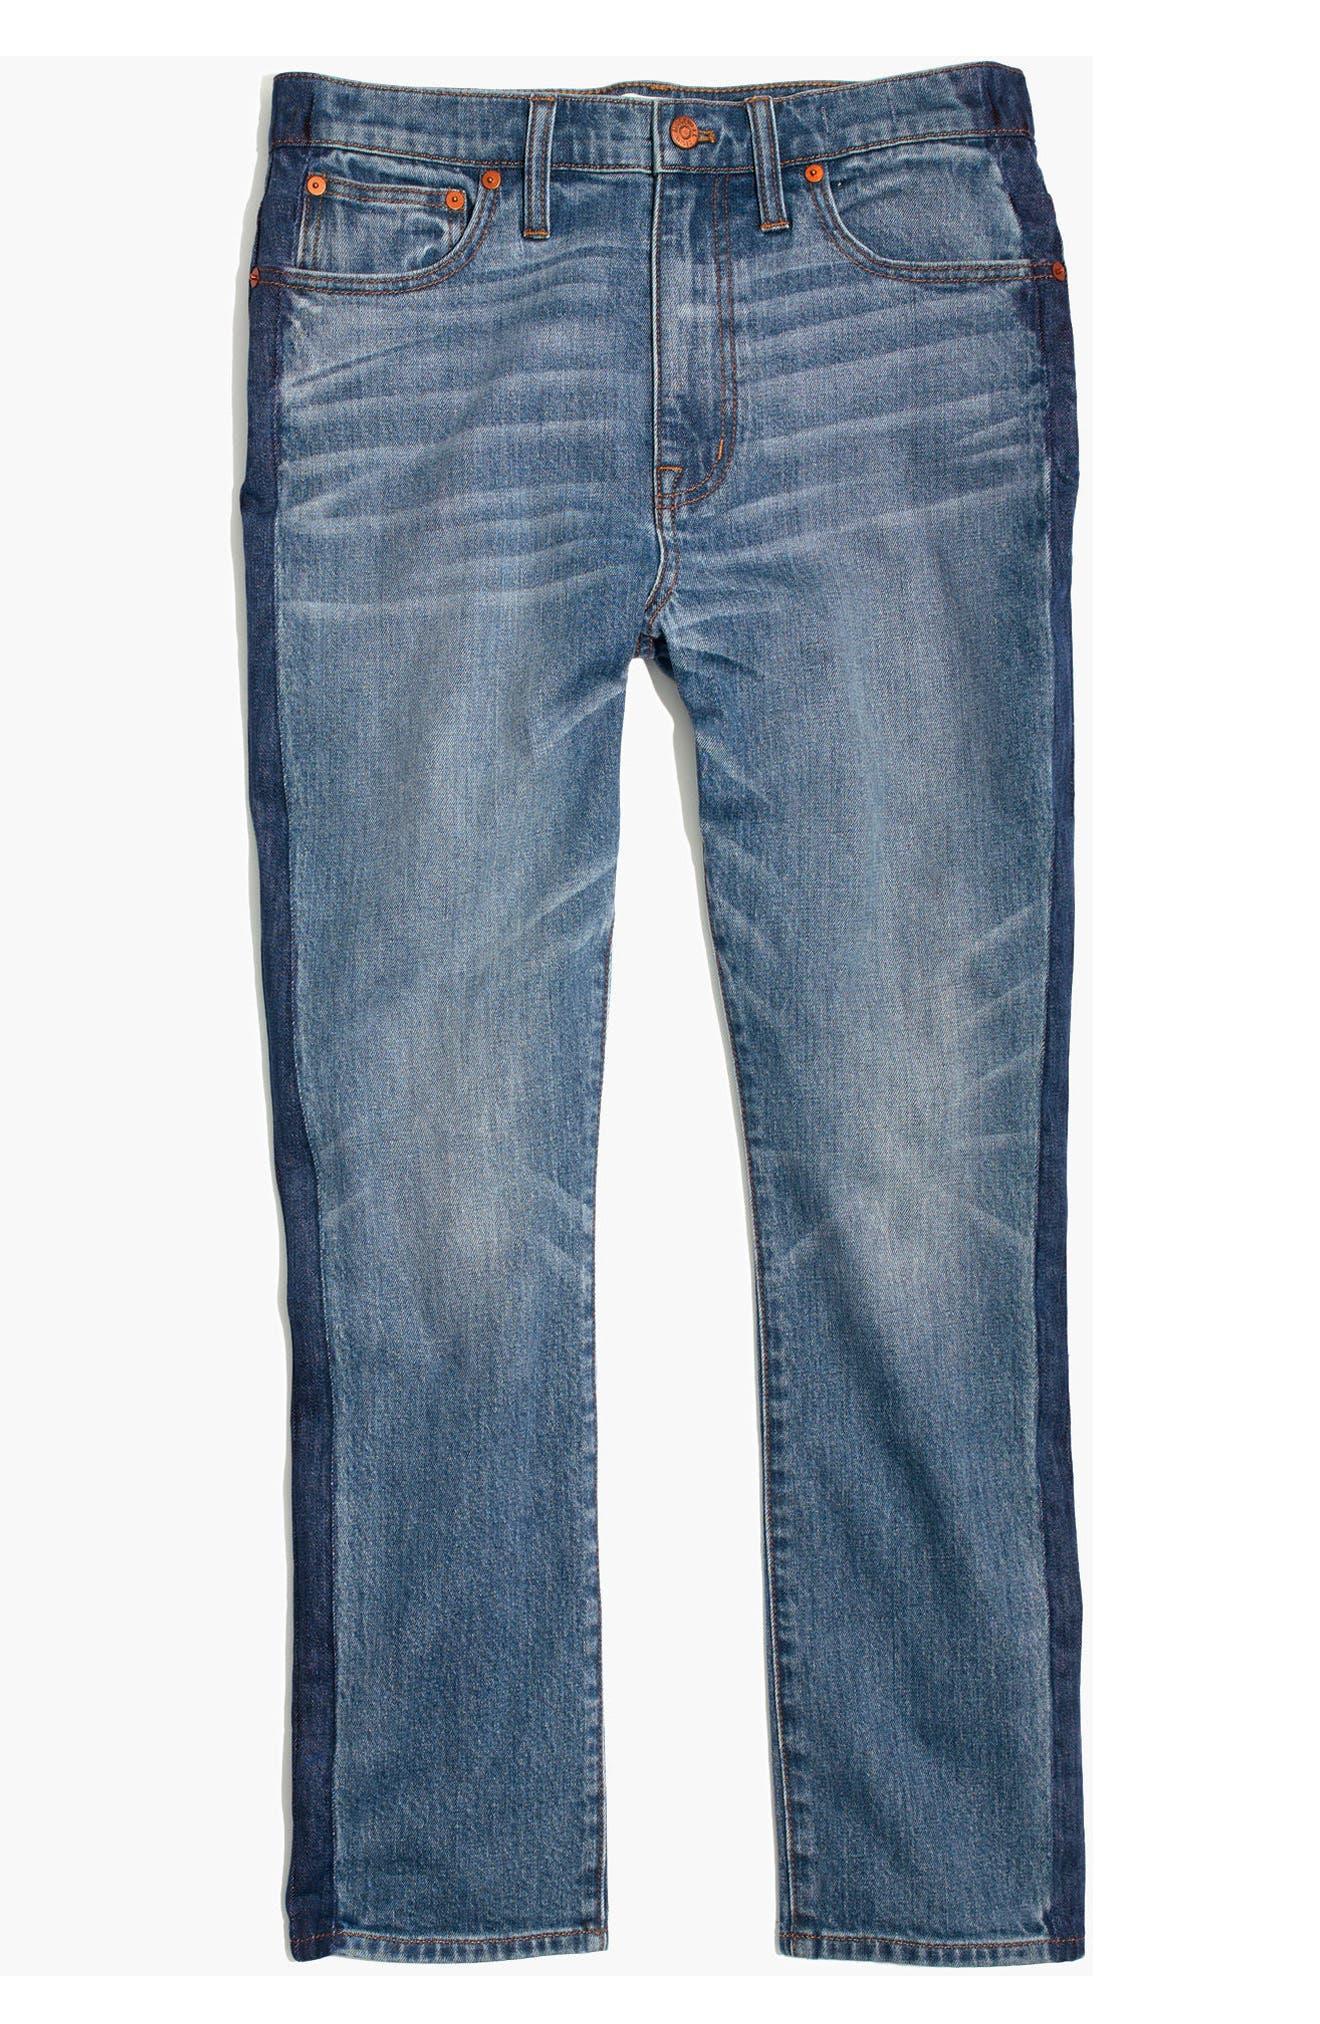 11-Inch High Rise Stripe Slim Boyfriend Jeans,                             Alternate thumbnail 3, color,                             Canton Wash